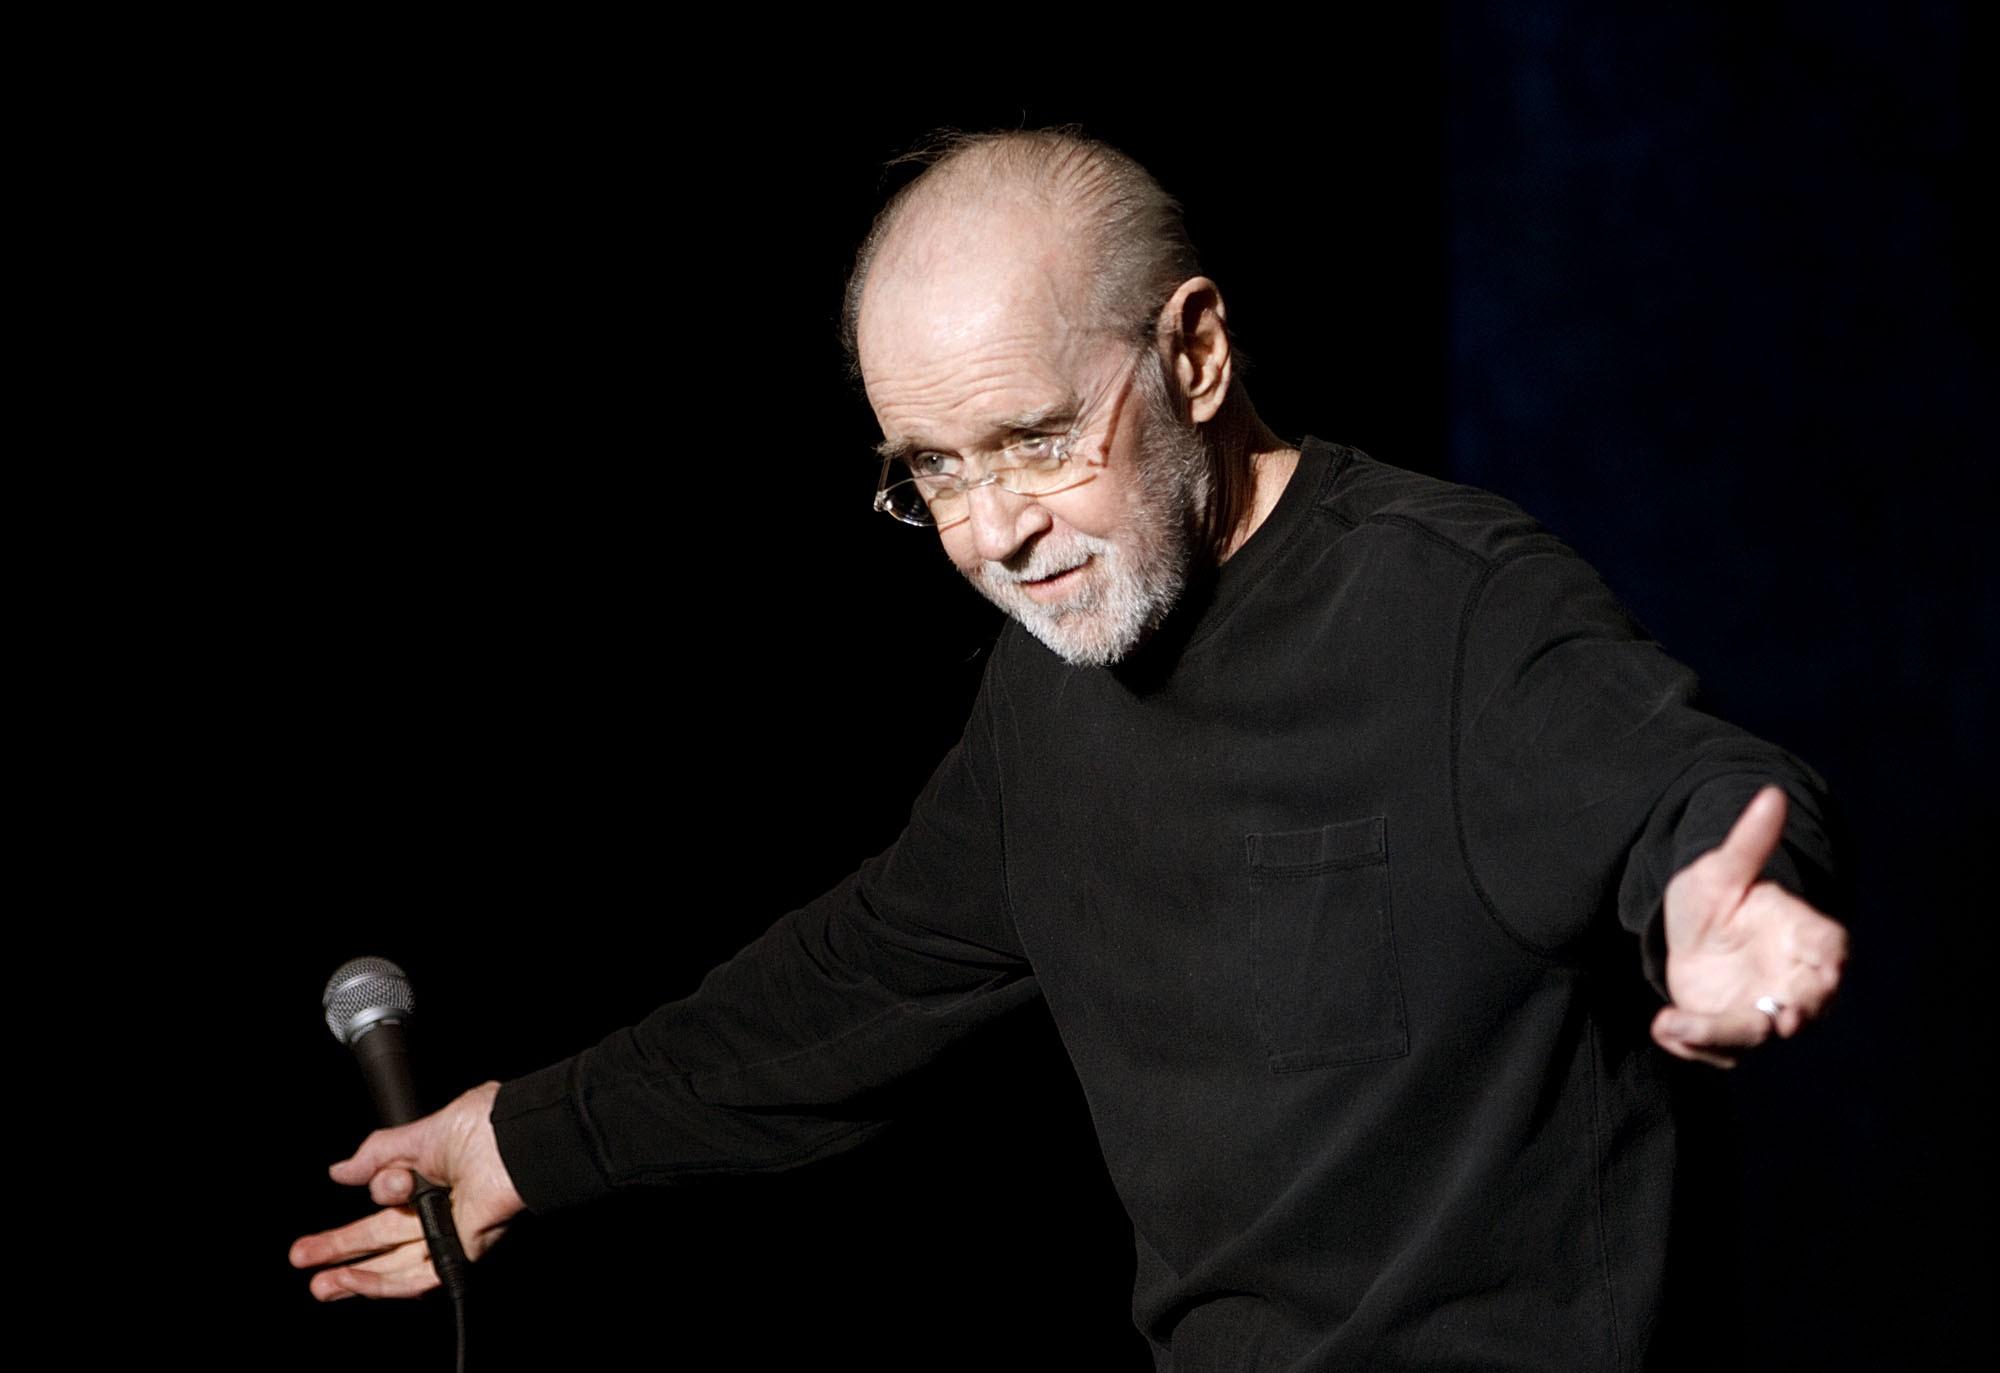 George Carlin in 2007